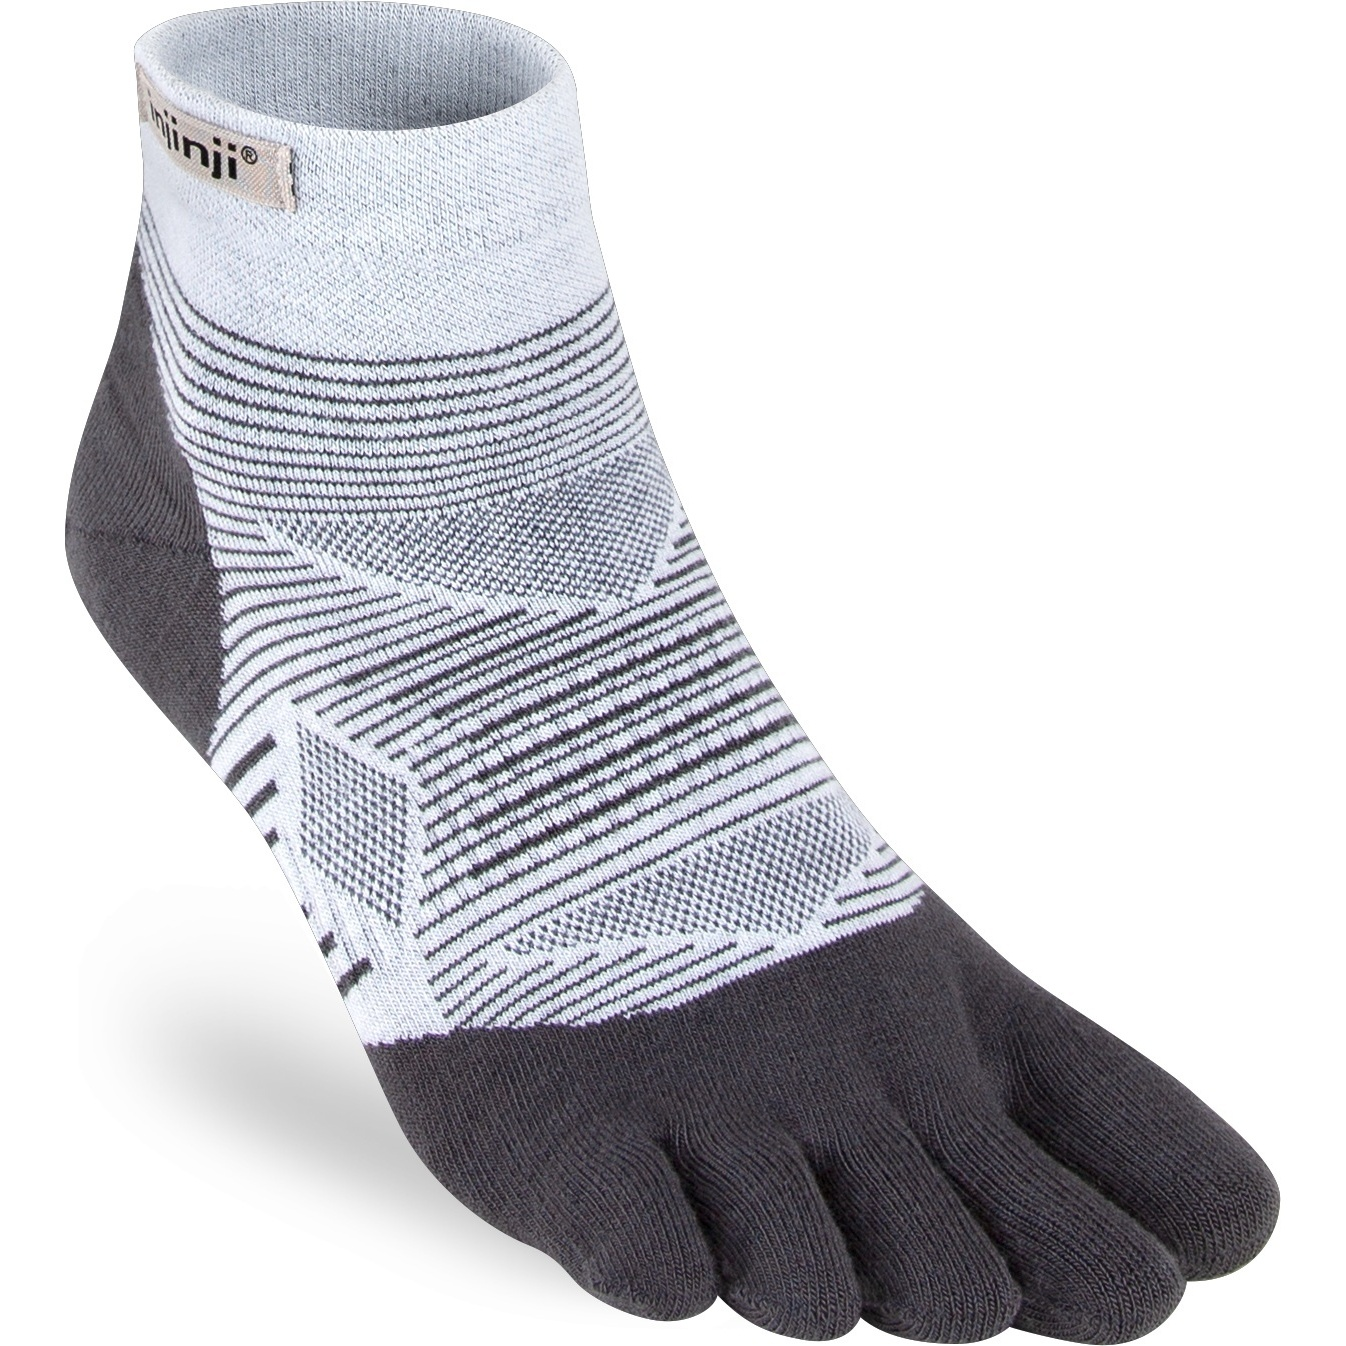 Produktbild von Injinji Run Lightweight Mini-Crew Socken 261130 - grau